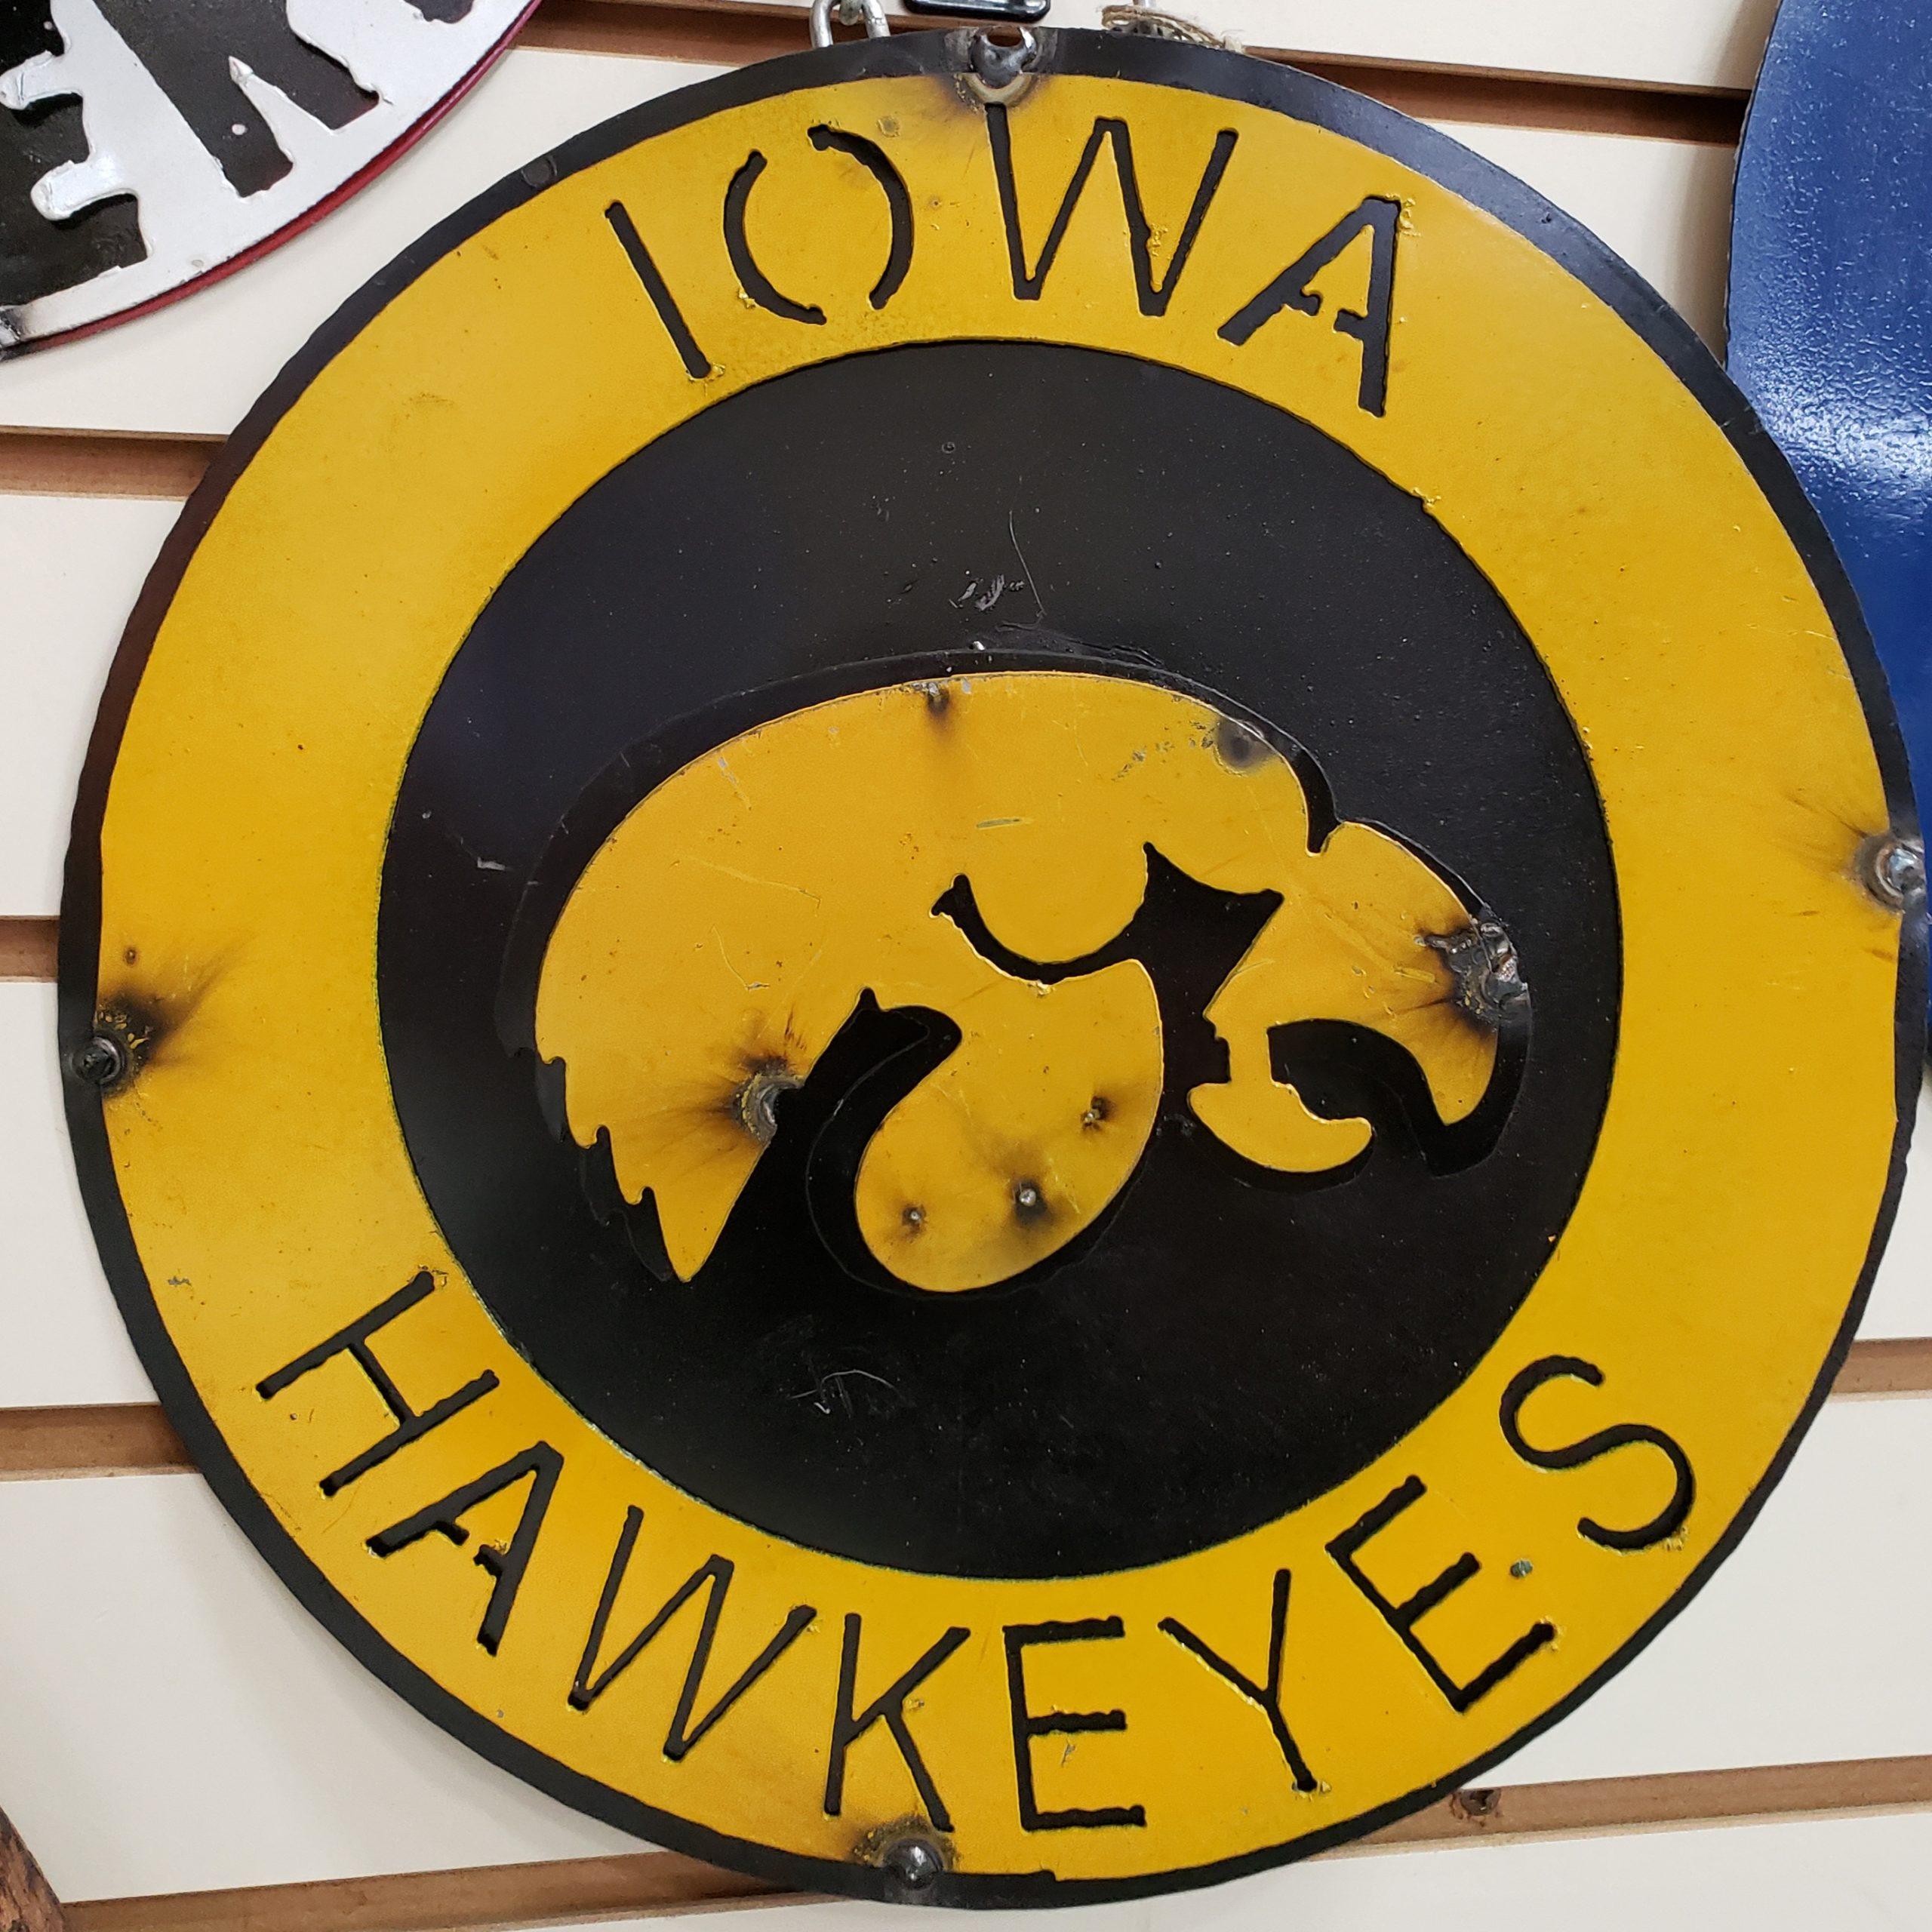 Iowa Hawkeyes 2 1